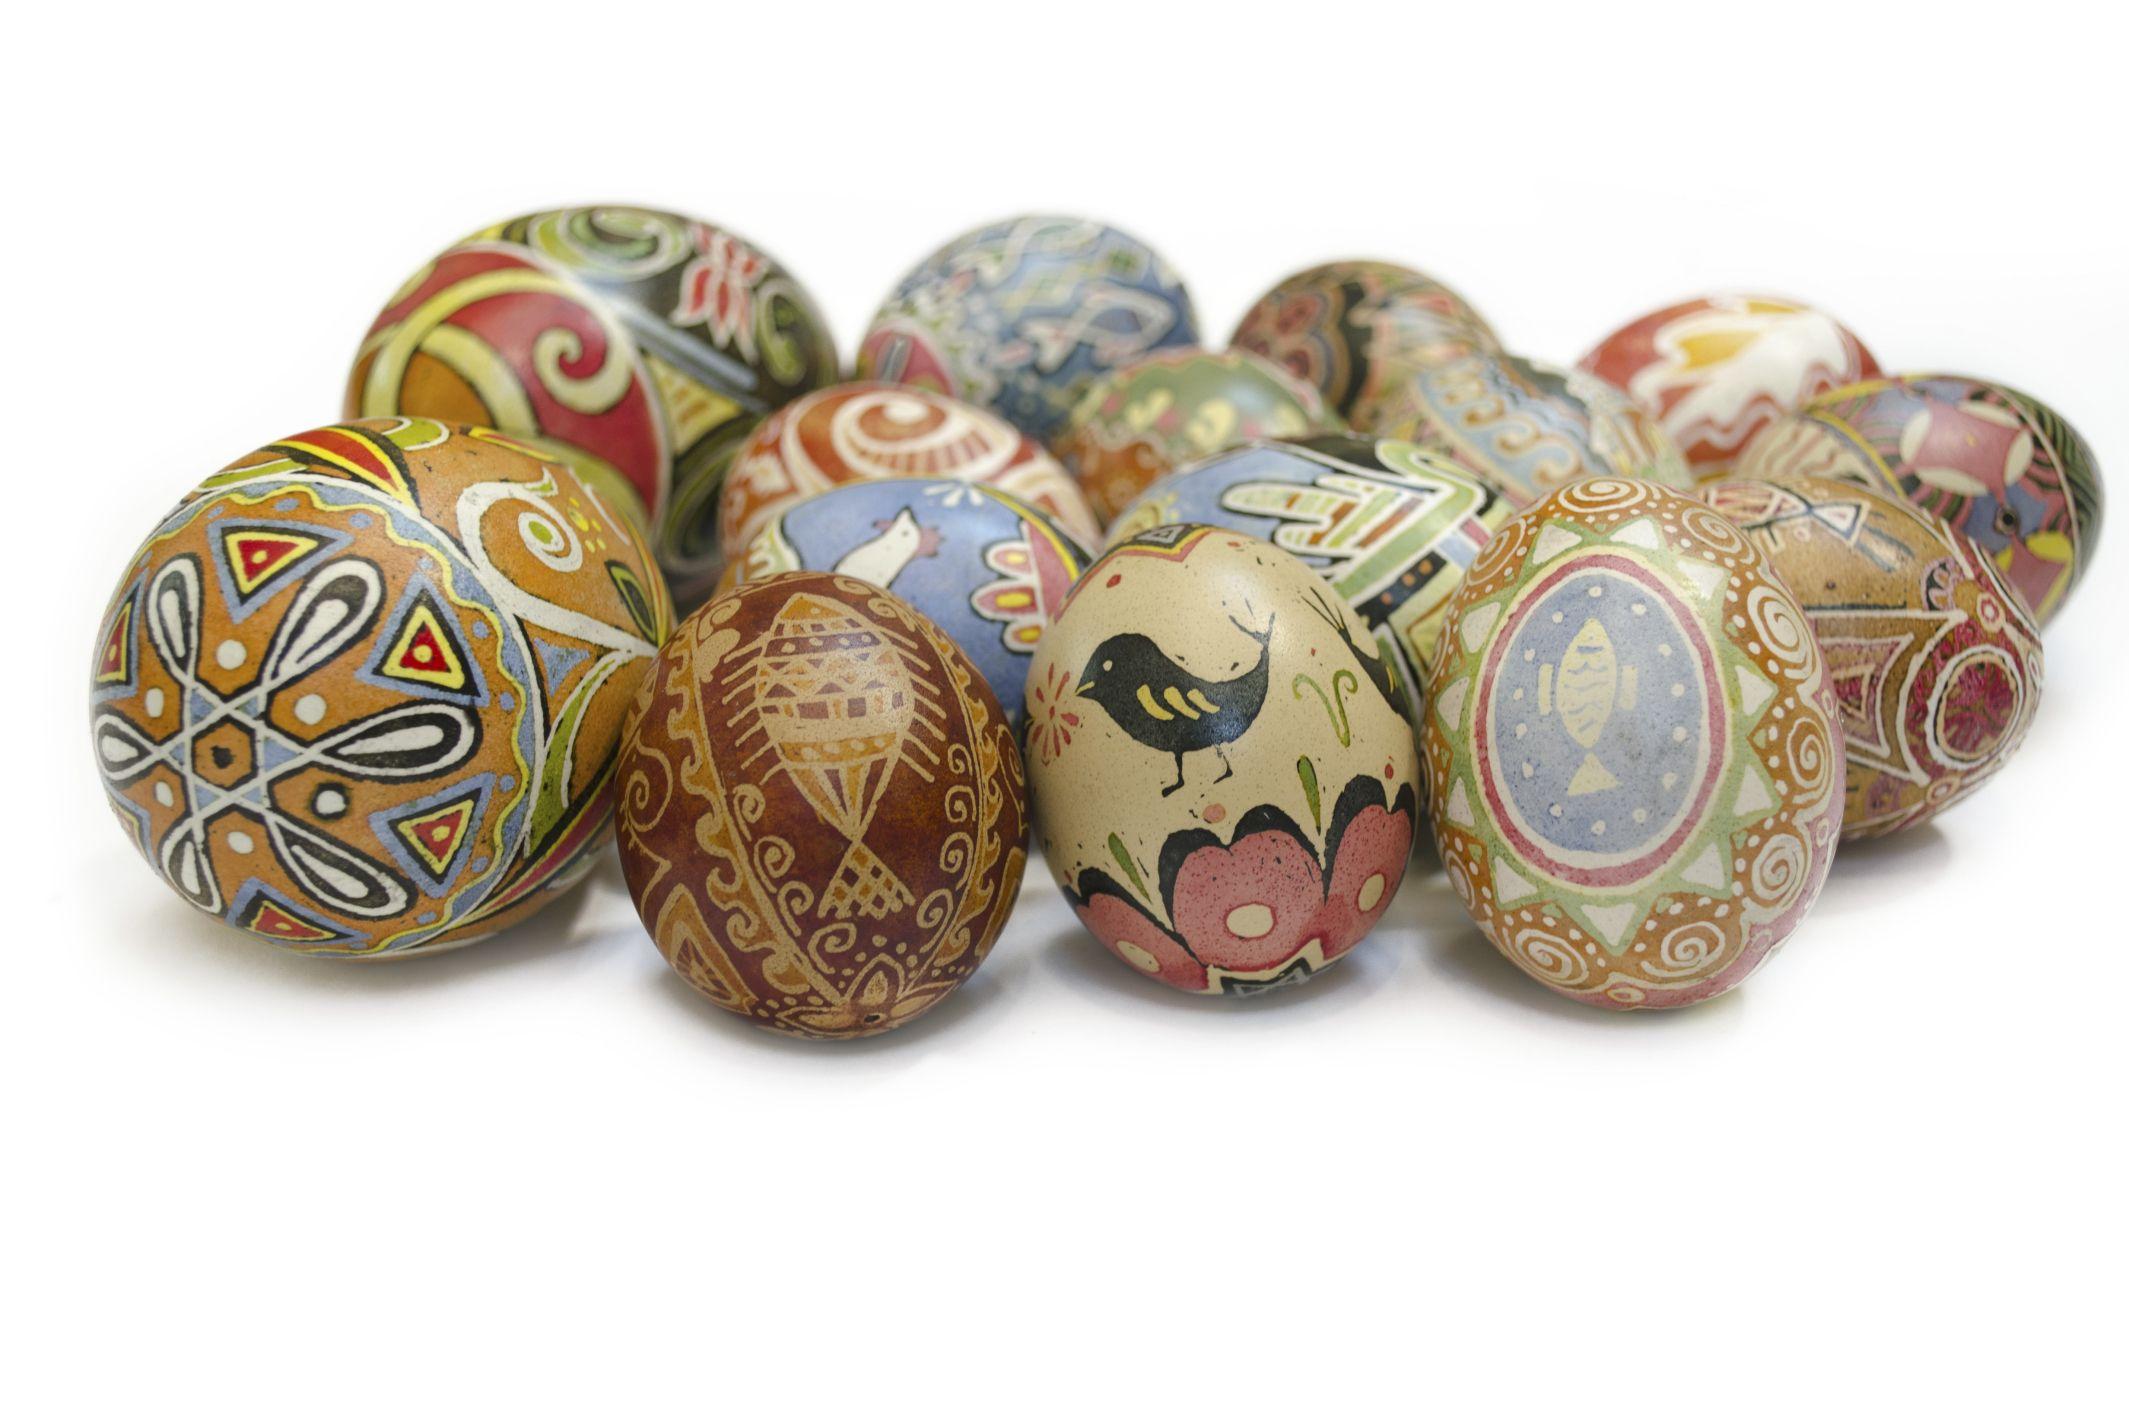 Some Truly Eggscellent Easter Trivia